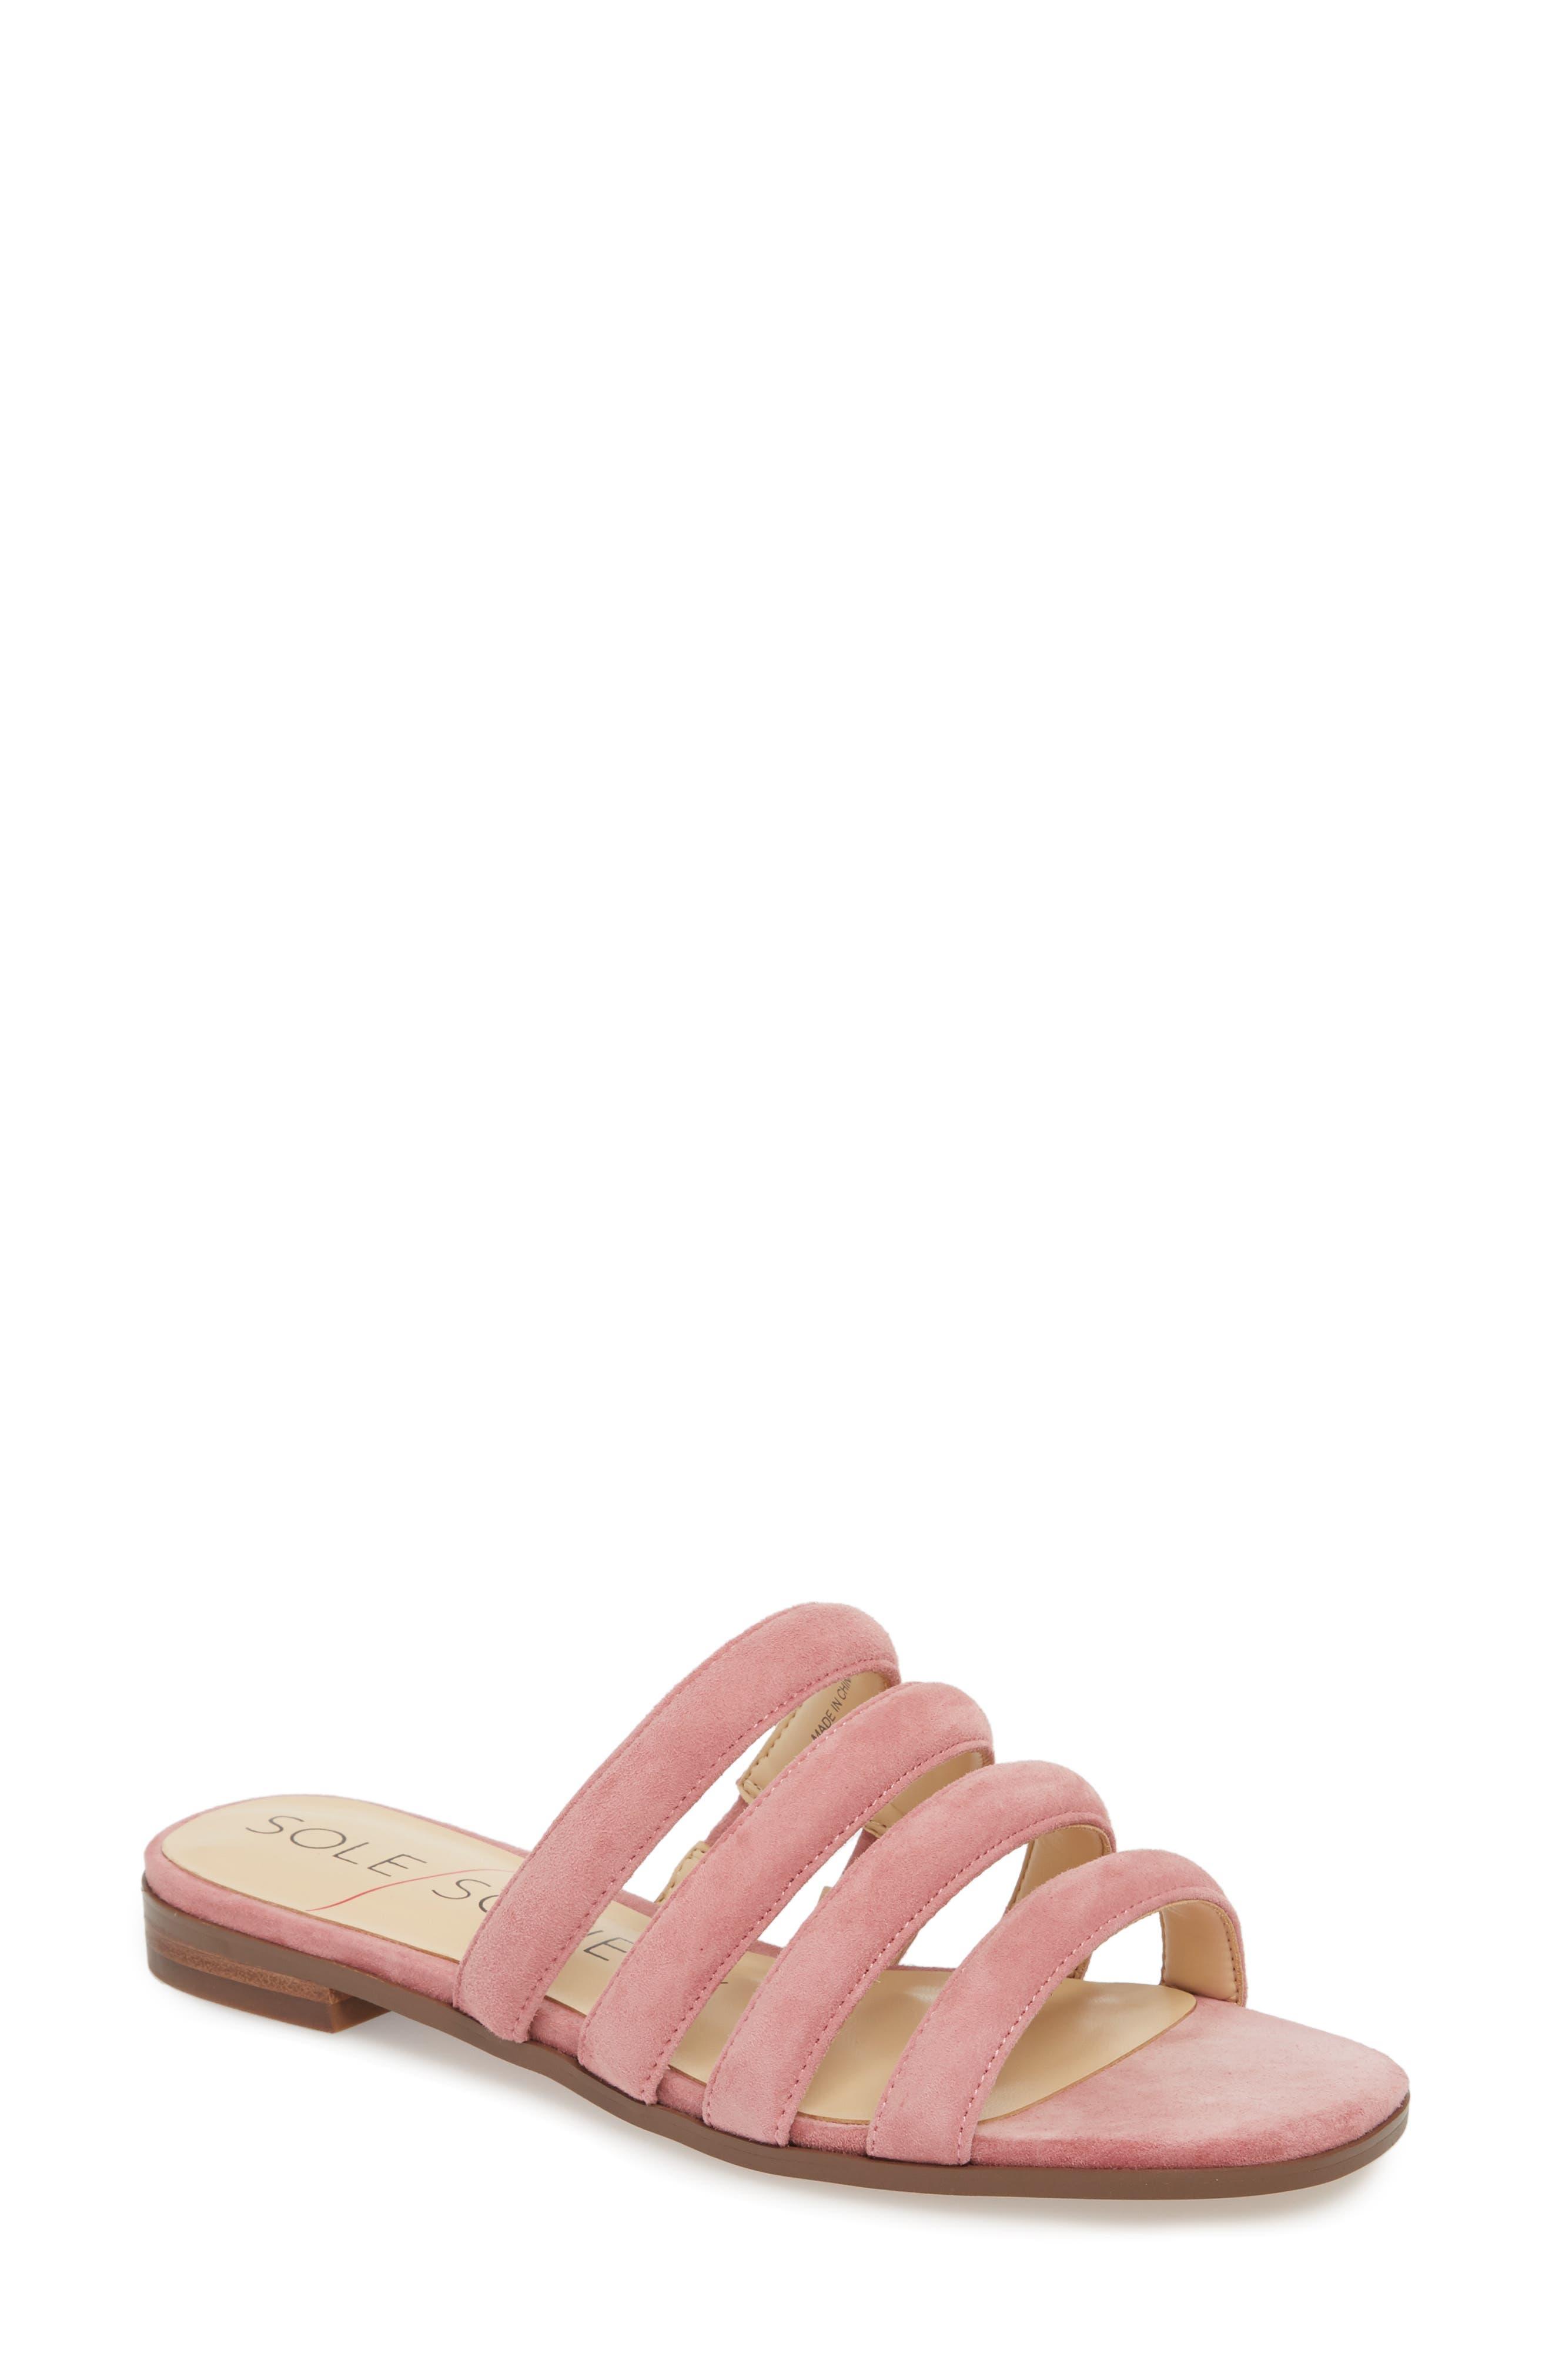 Sole Society Saxten Strappy Slide Sandal, Pink